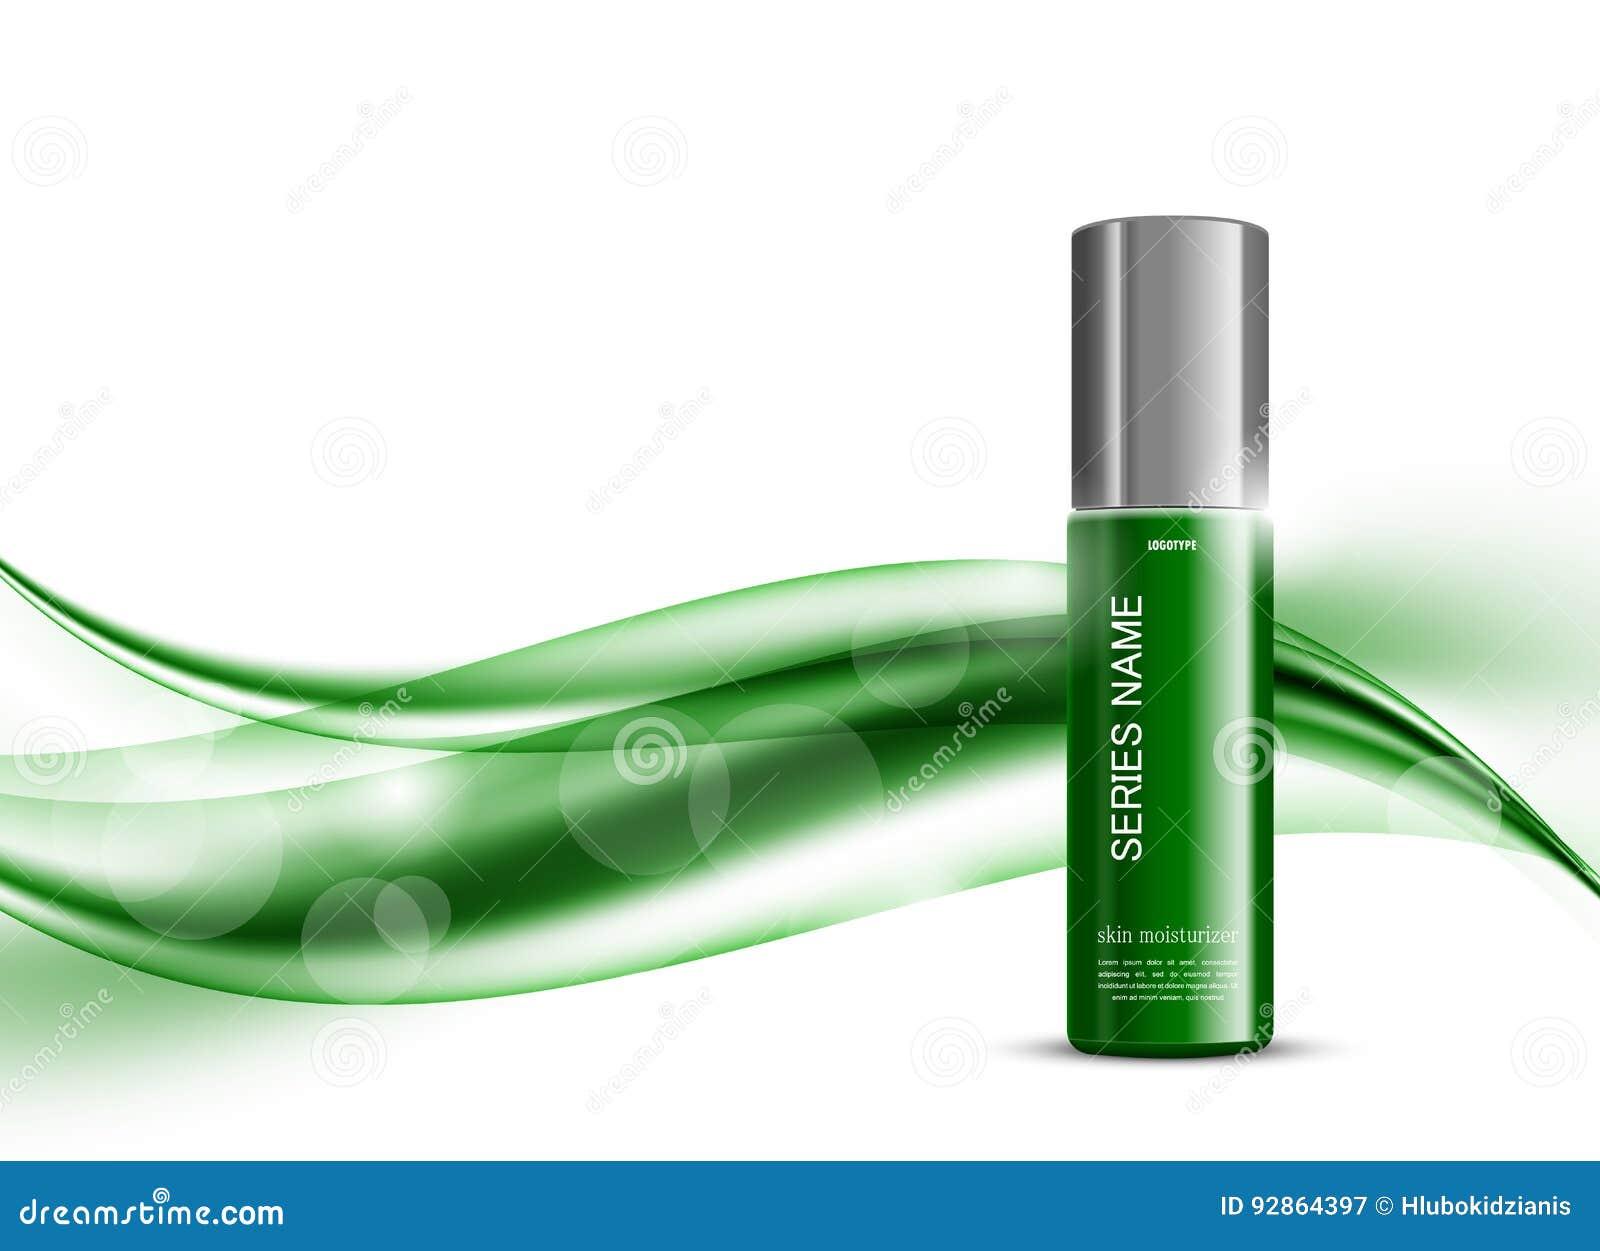 Skin moisturizer cosmetic design template